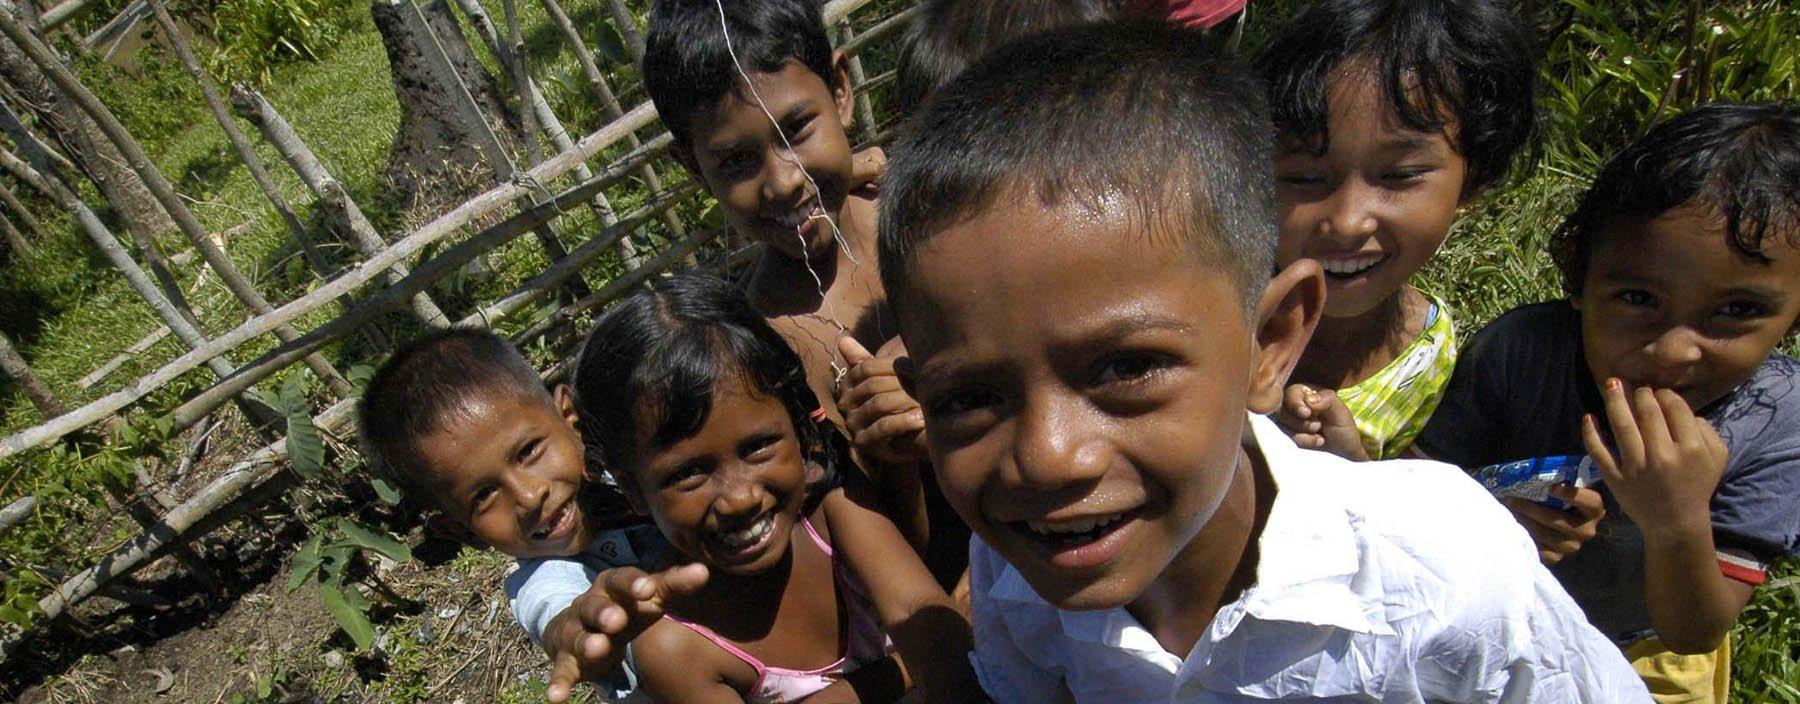 id, sumatra, kinderen.jpg